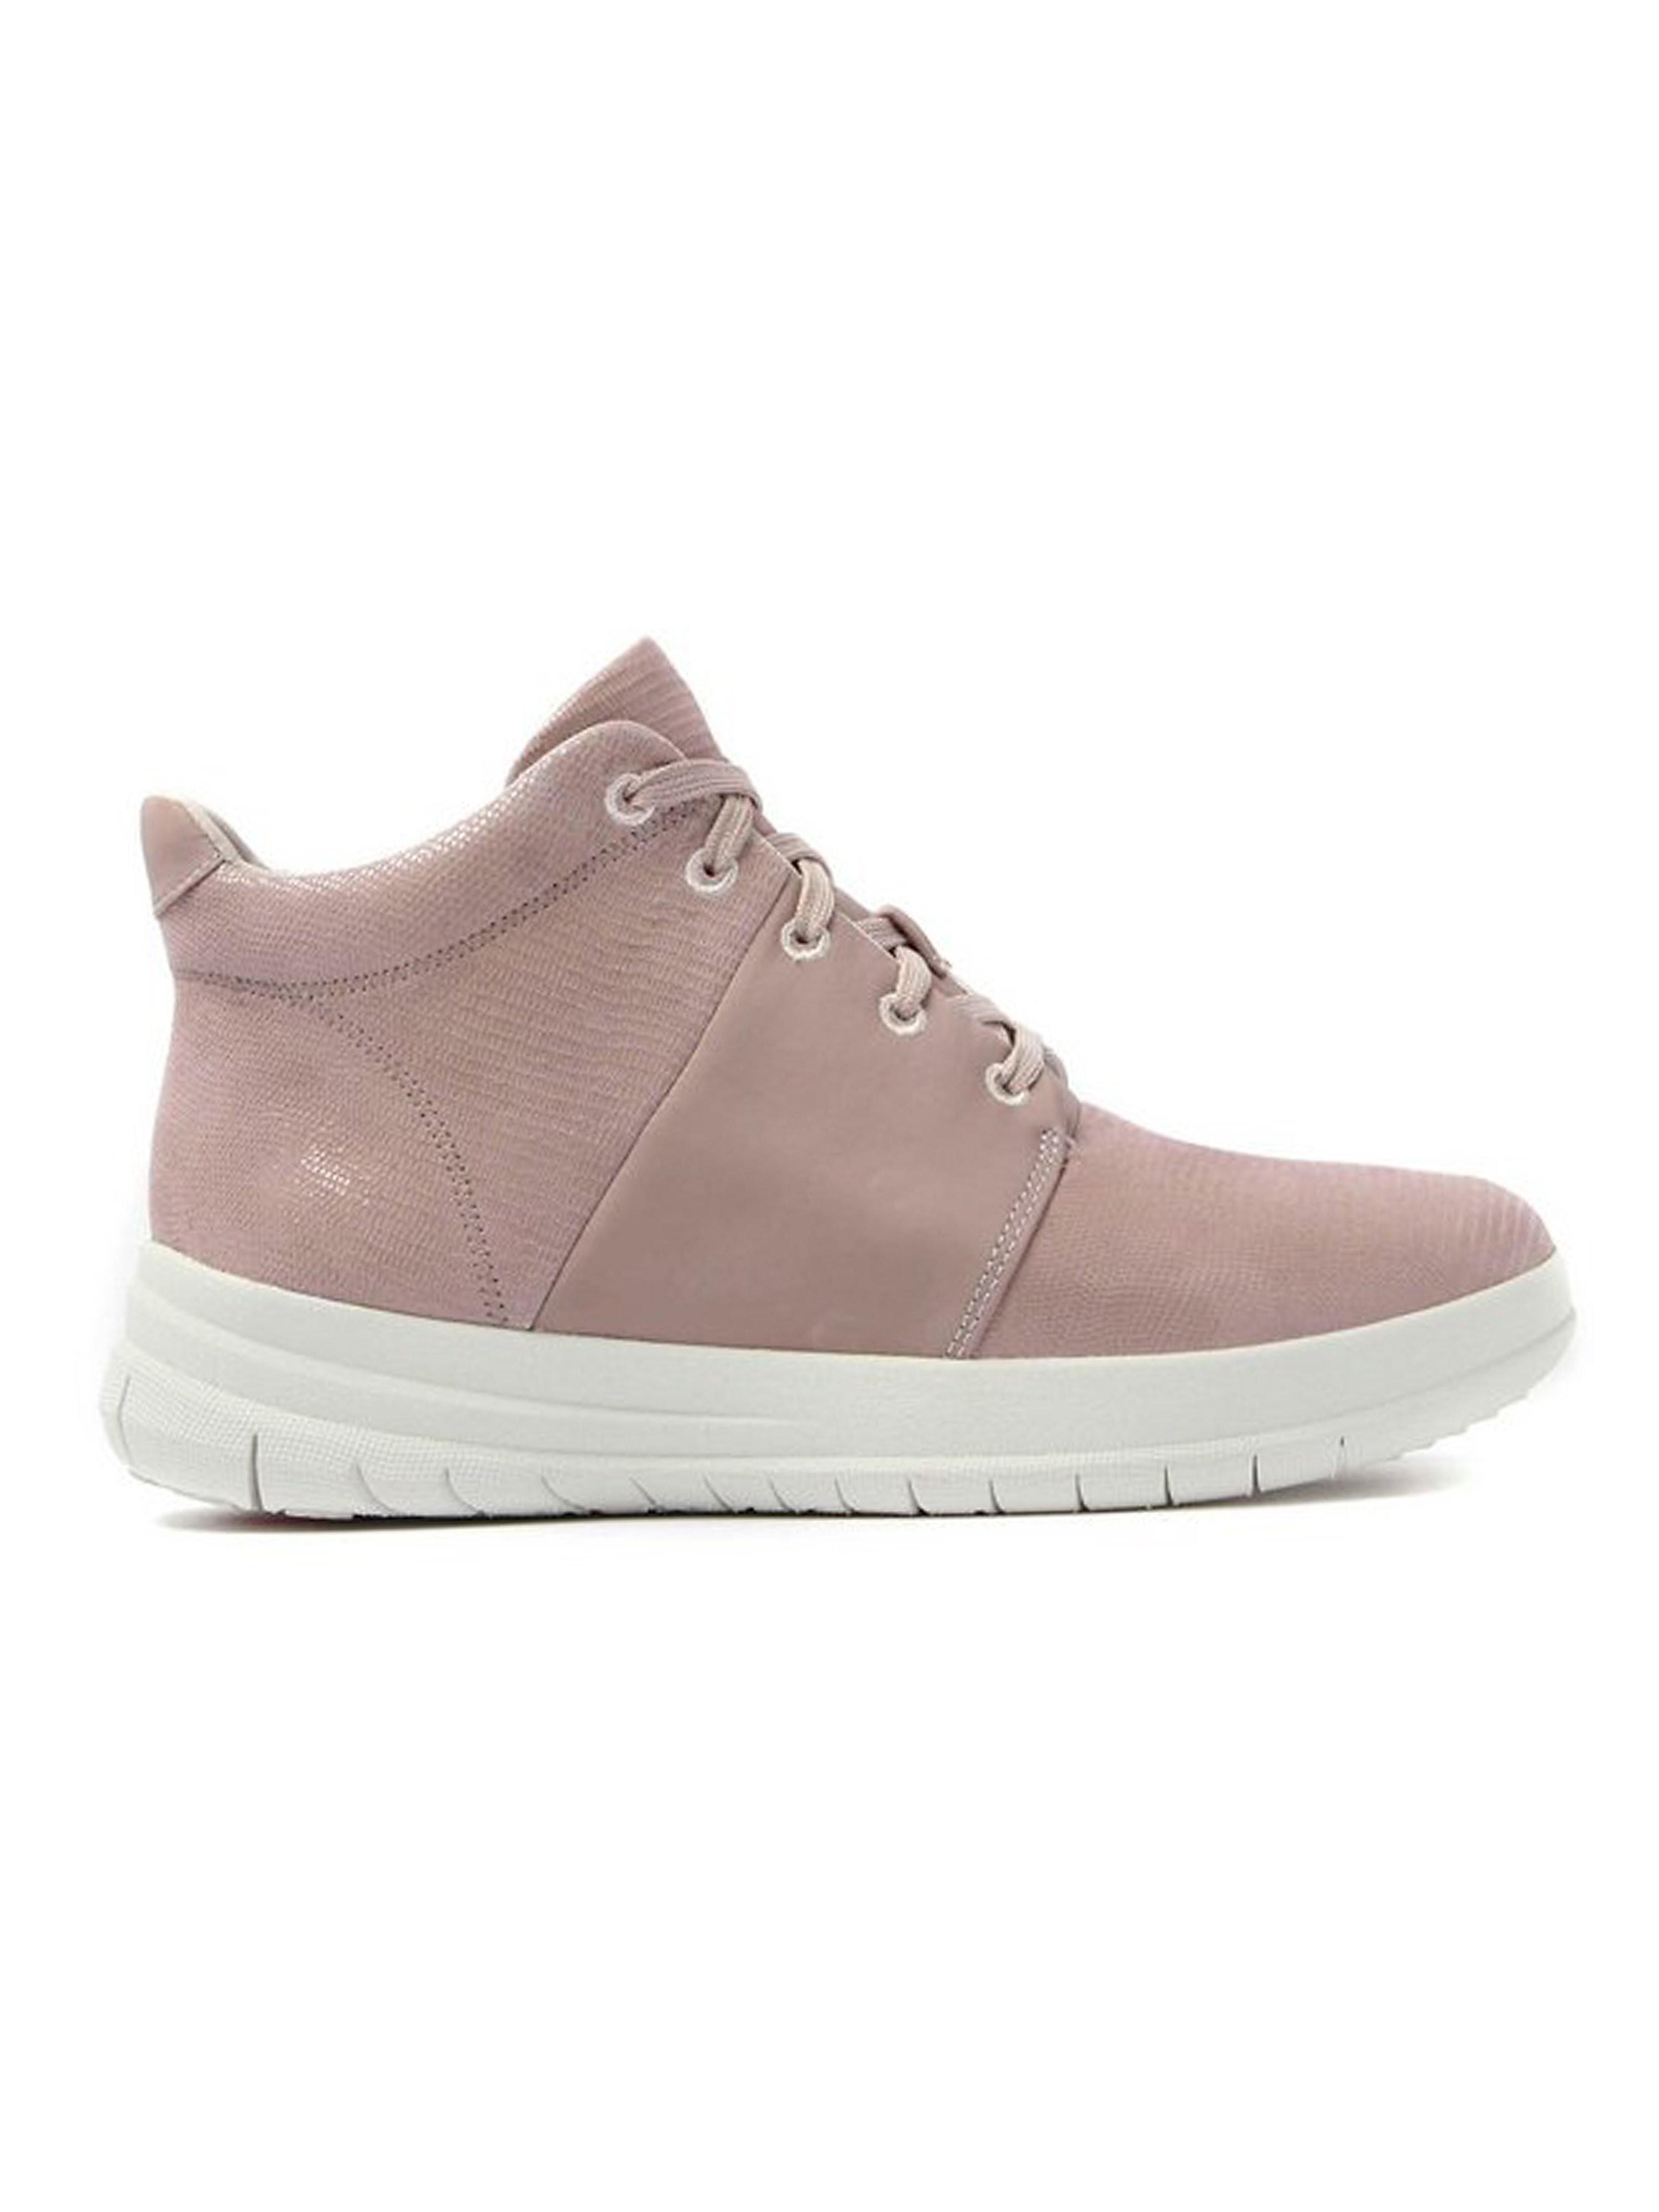 FitFlop Women's Sporty-Pop X Lizard Print High-Top Sneakers - Nude Pink